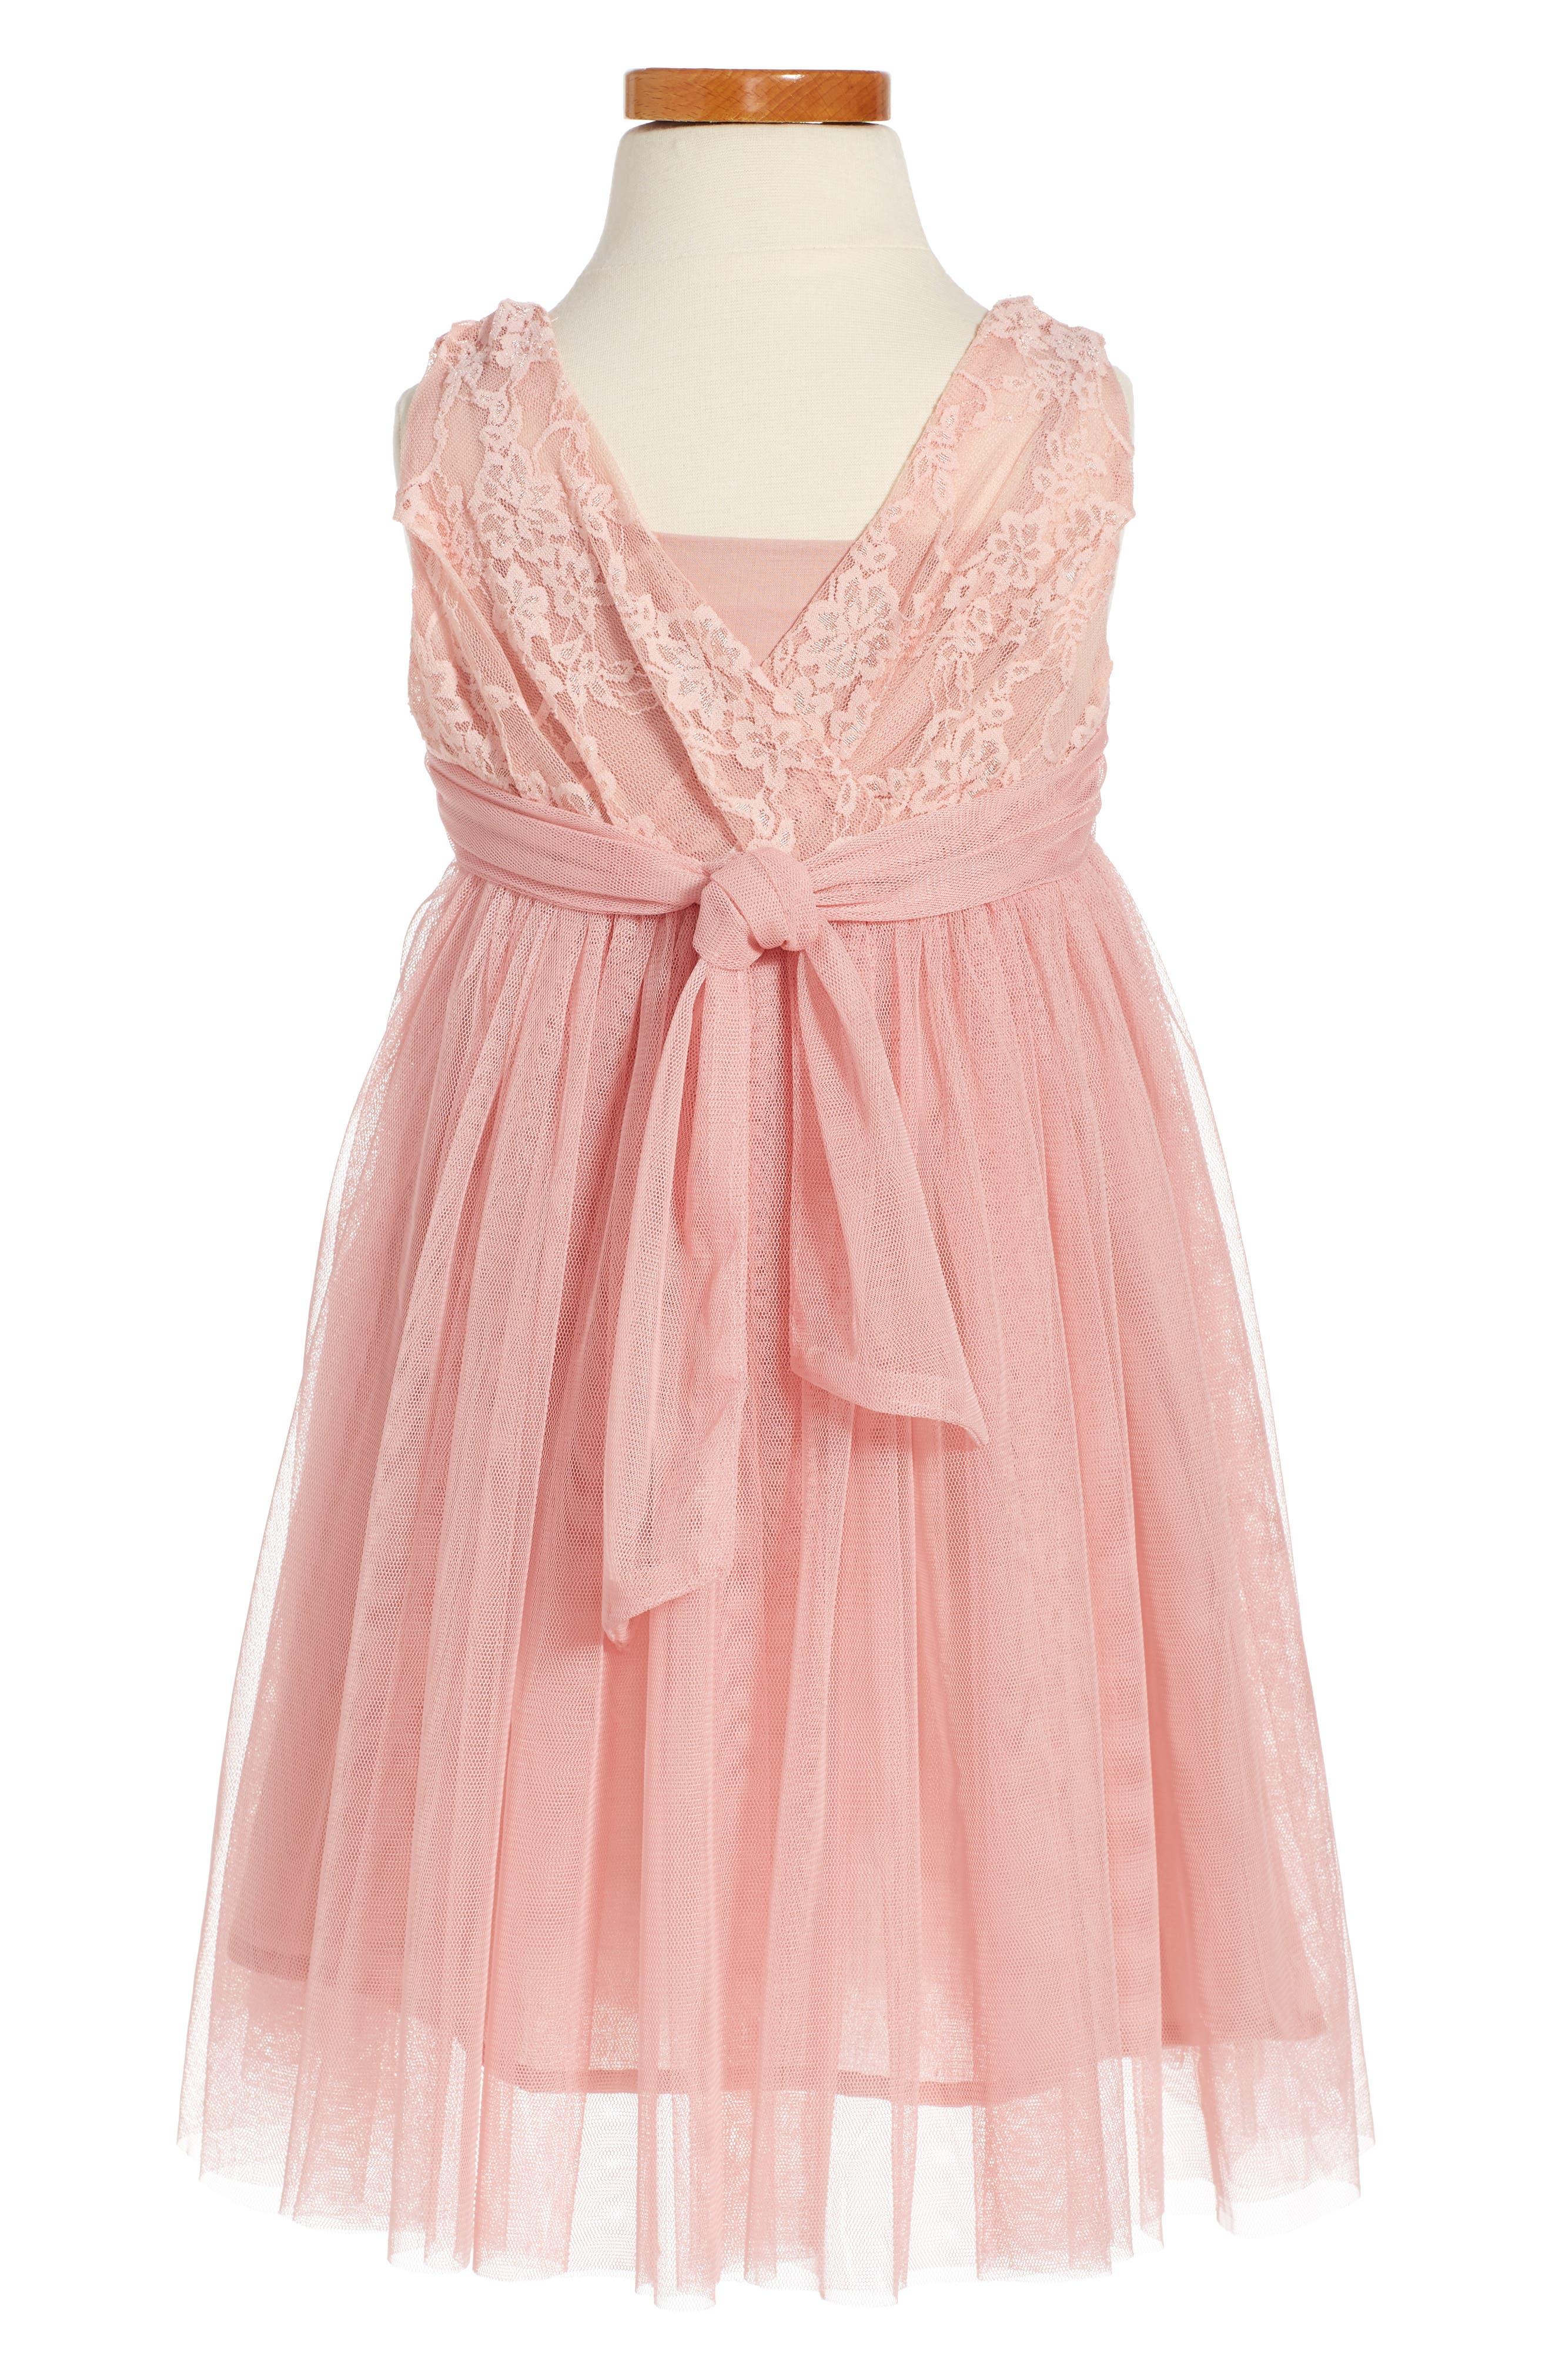 Butterfly Sleeveless Dress,                             Alternate thumbnail 2, color,                             653